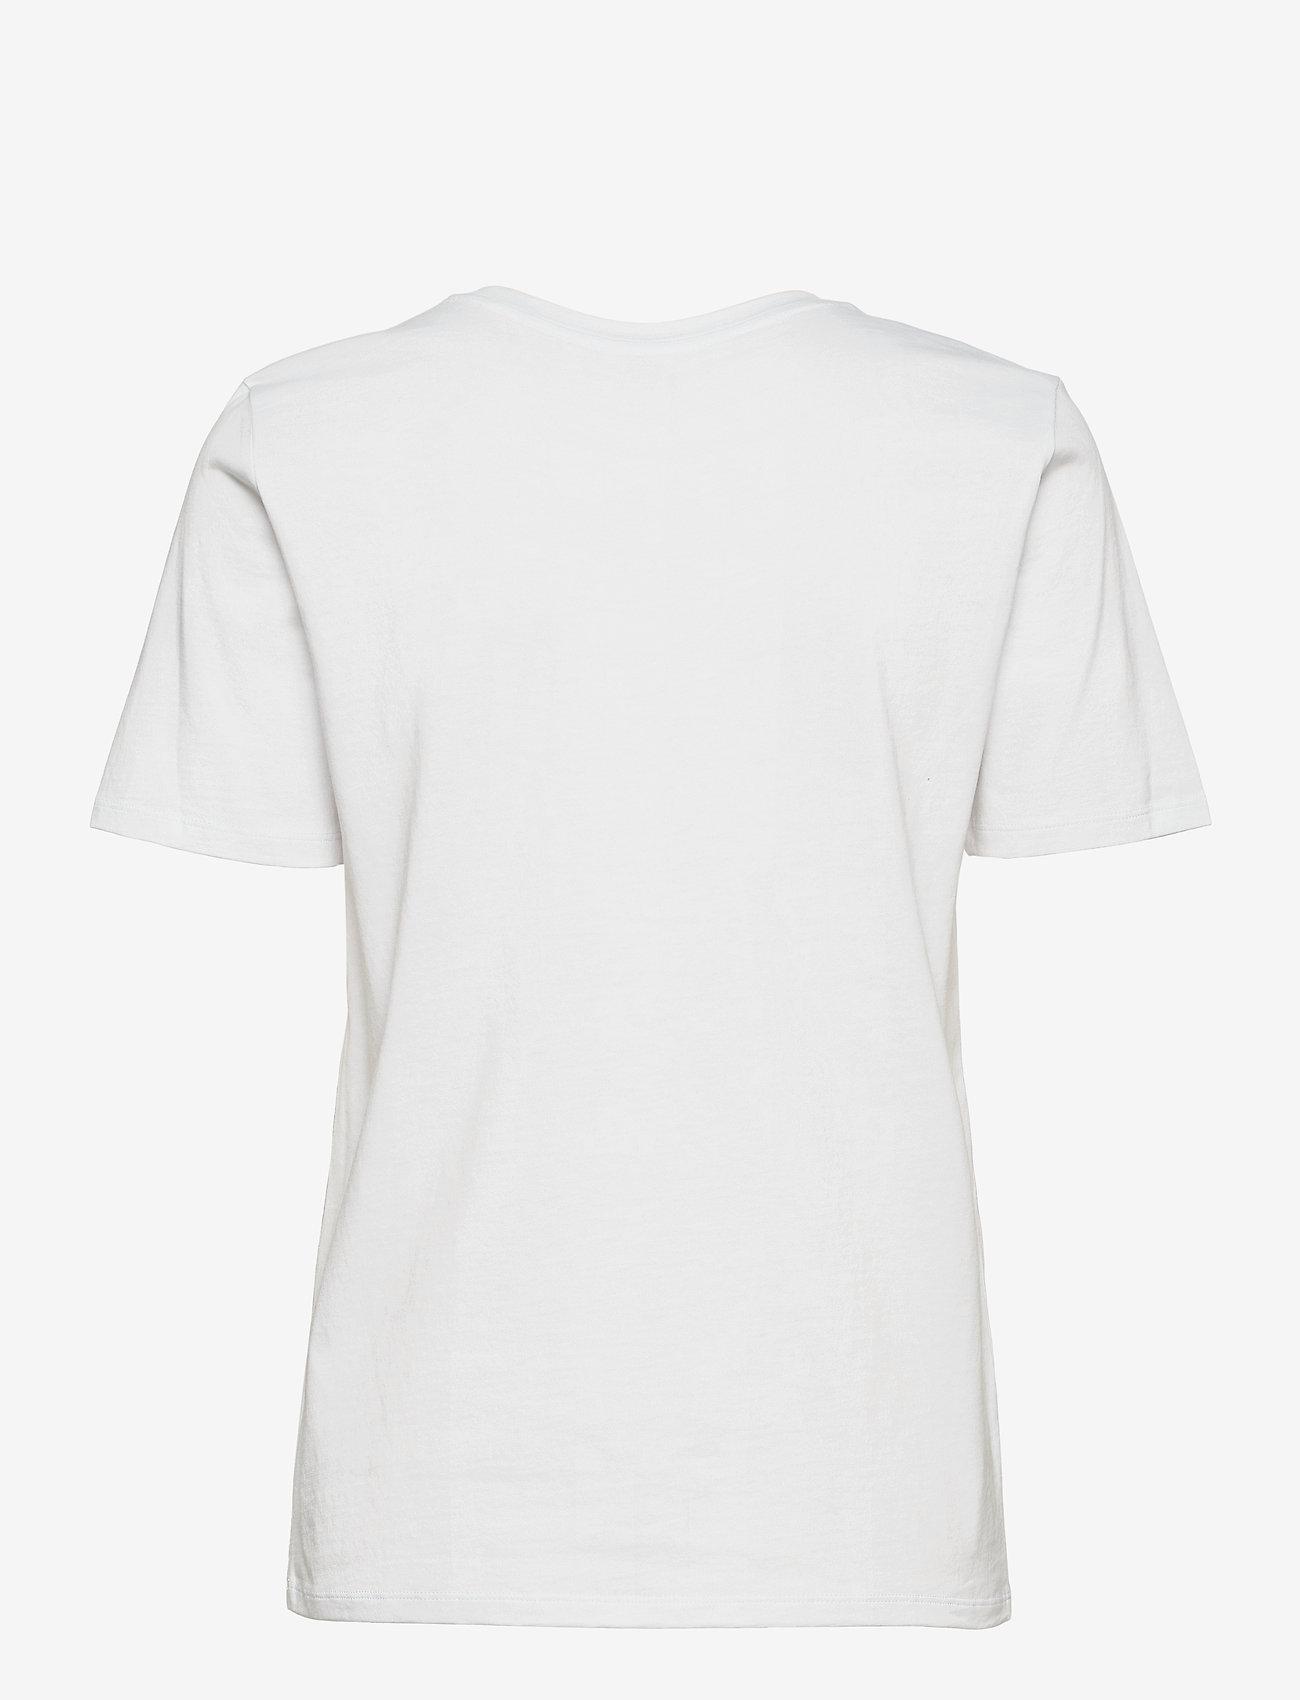 Michael Kors - KORS STUDDED CLASSIC TEE - t-shirts - white - 1